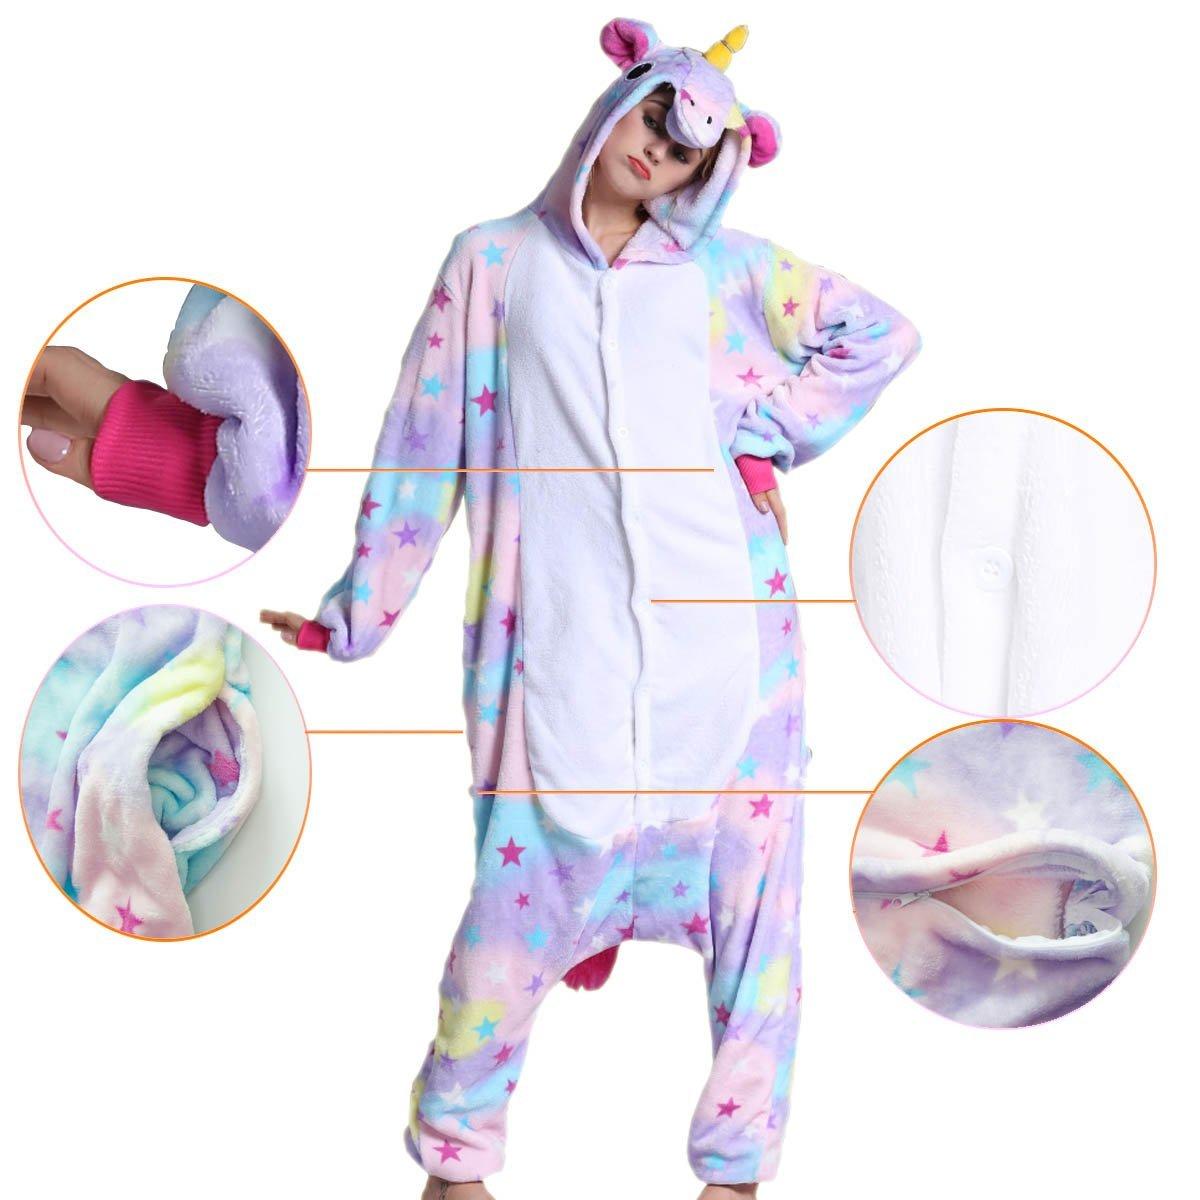 98bca457acb Adulto Unisex Franela Unicornio Animal Onesies Pijamas OnePiece Cosplay  (estrella, L): Amazon